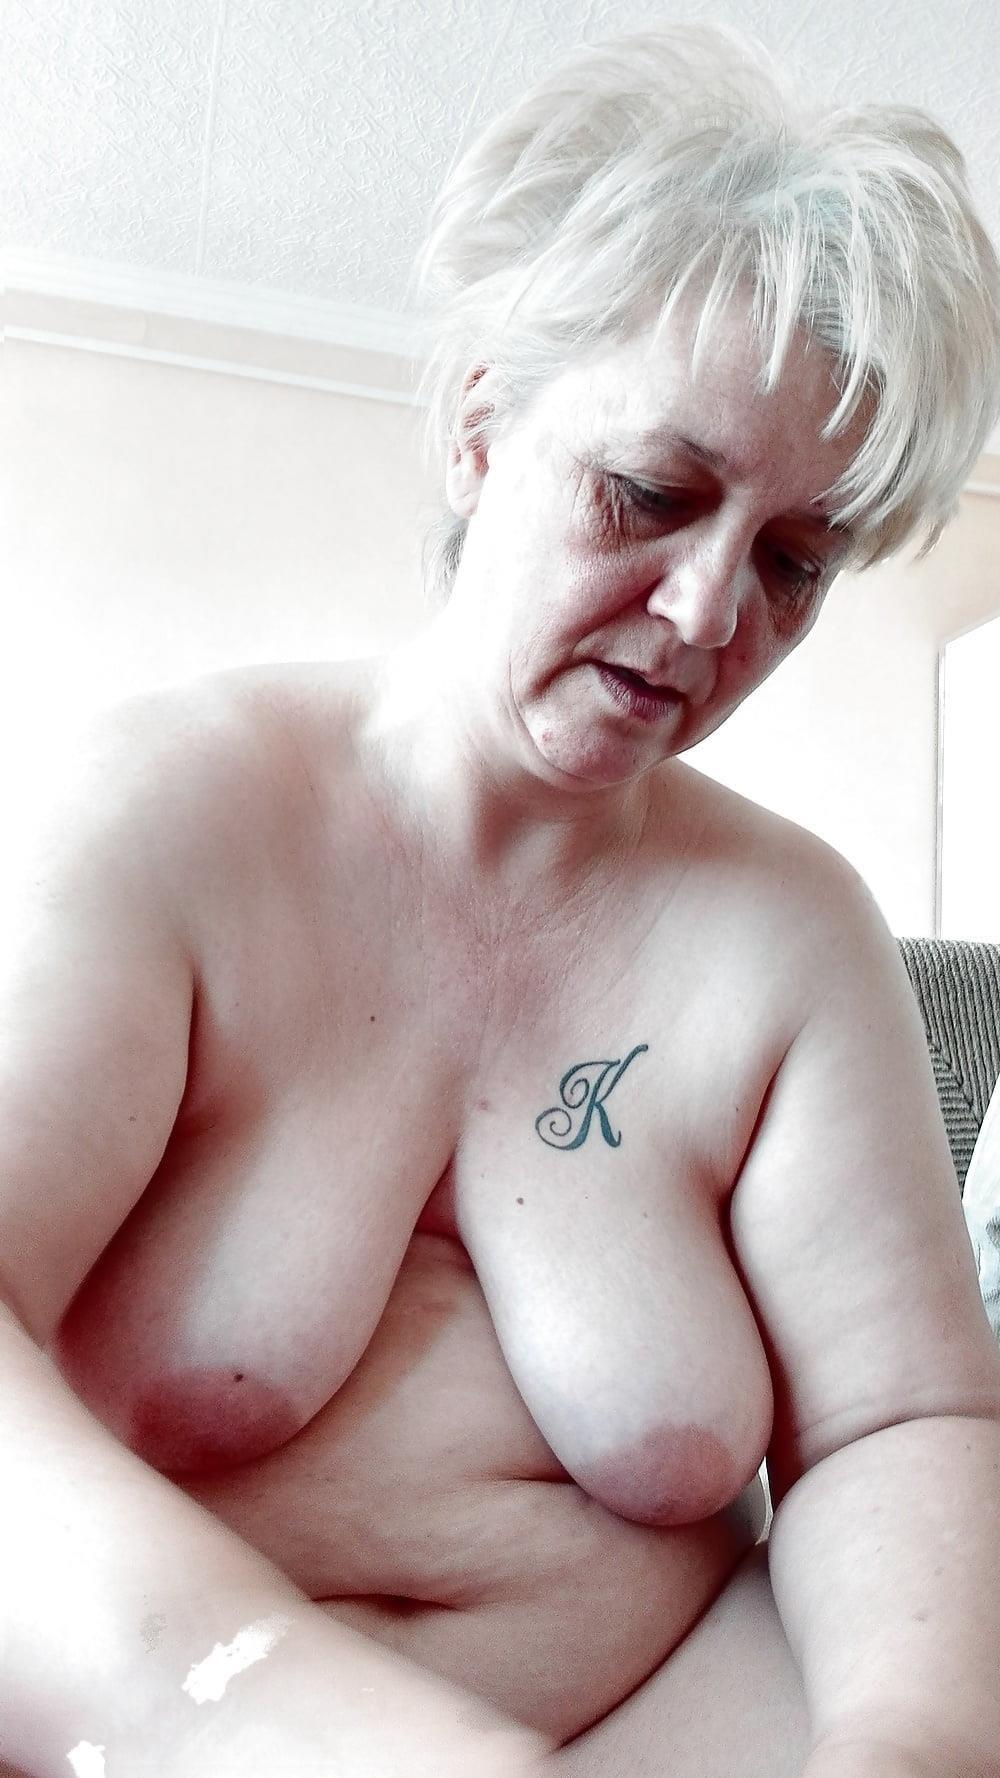 Big tits creampie pics-8143